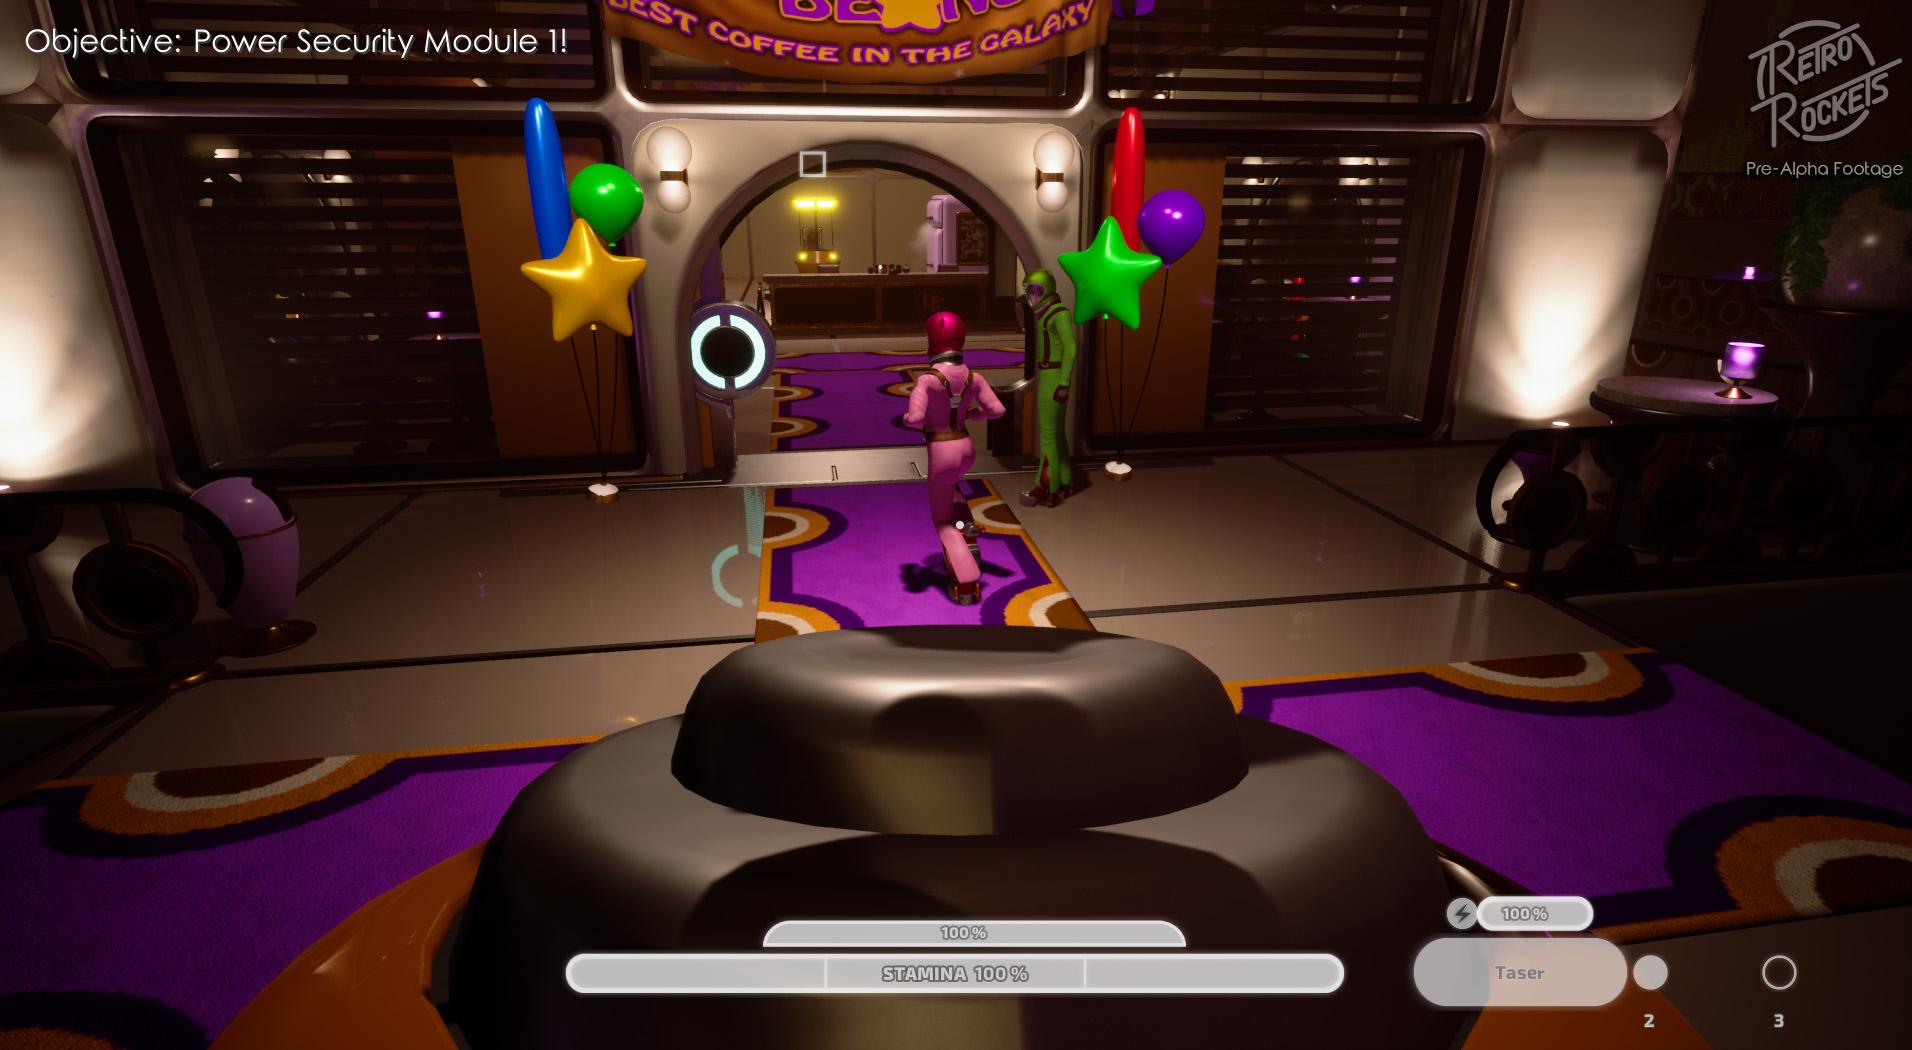 gameplayScreenshot_01.jpg